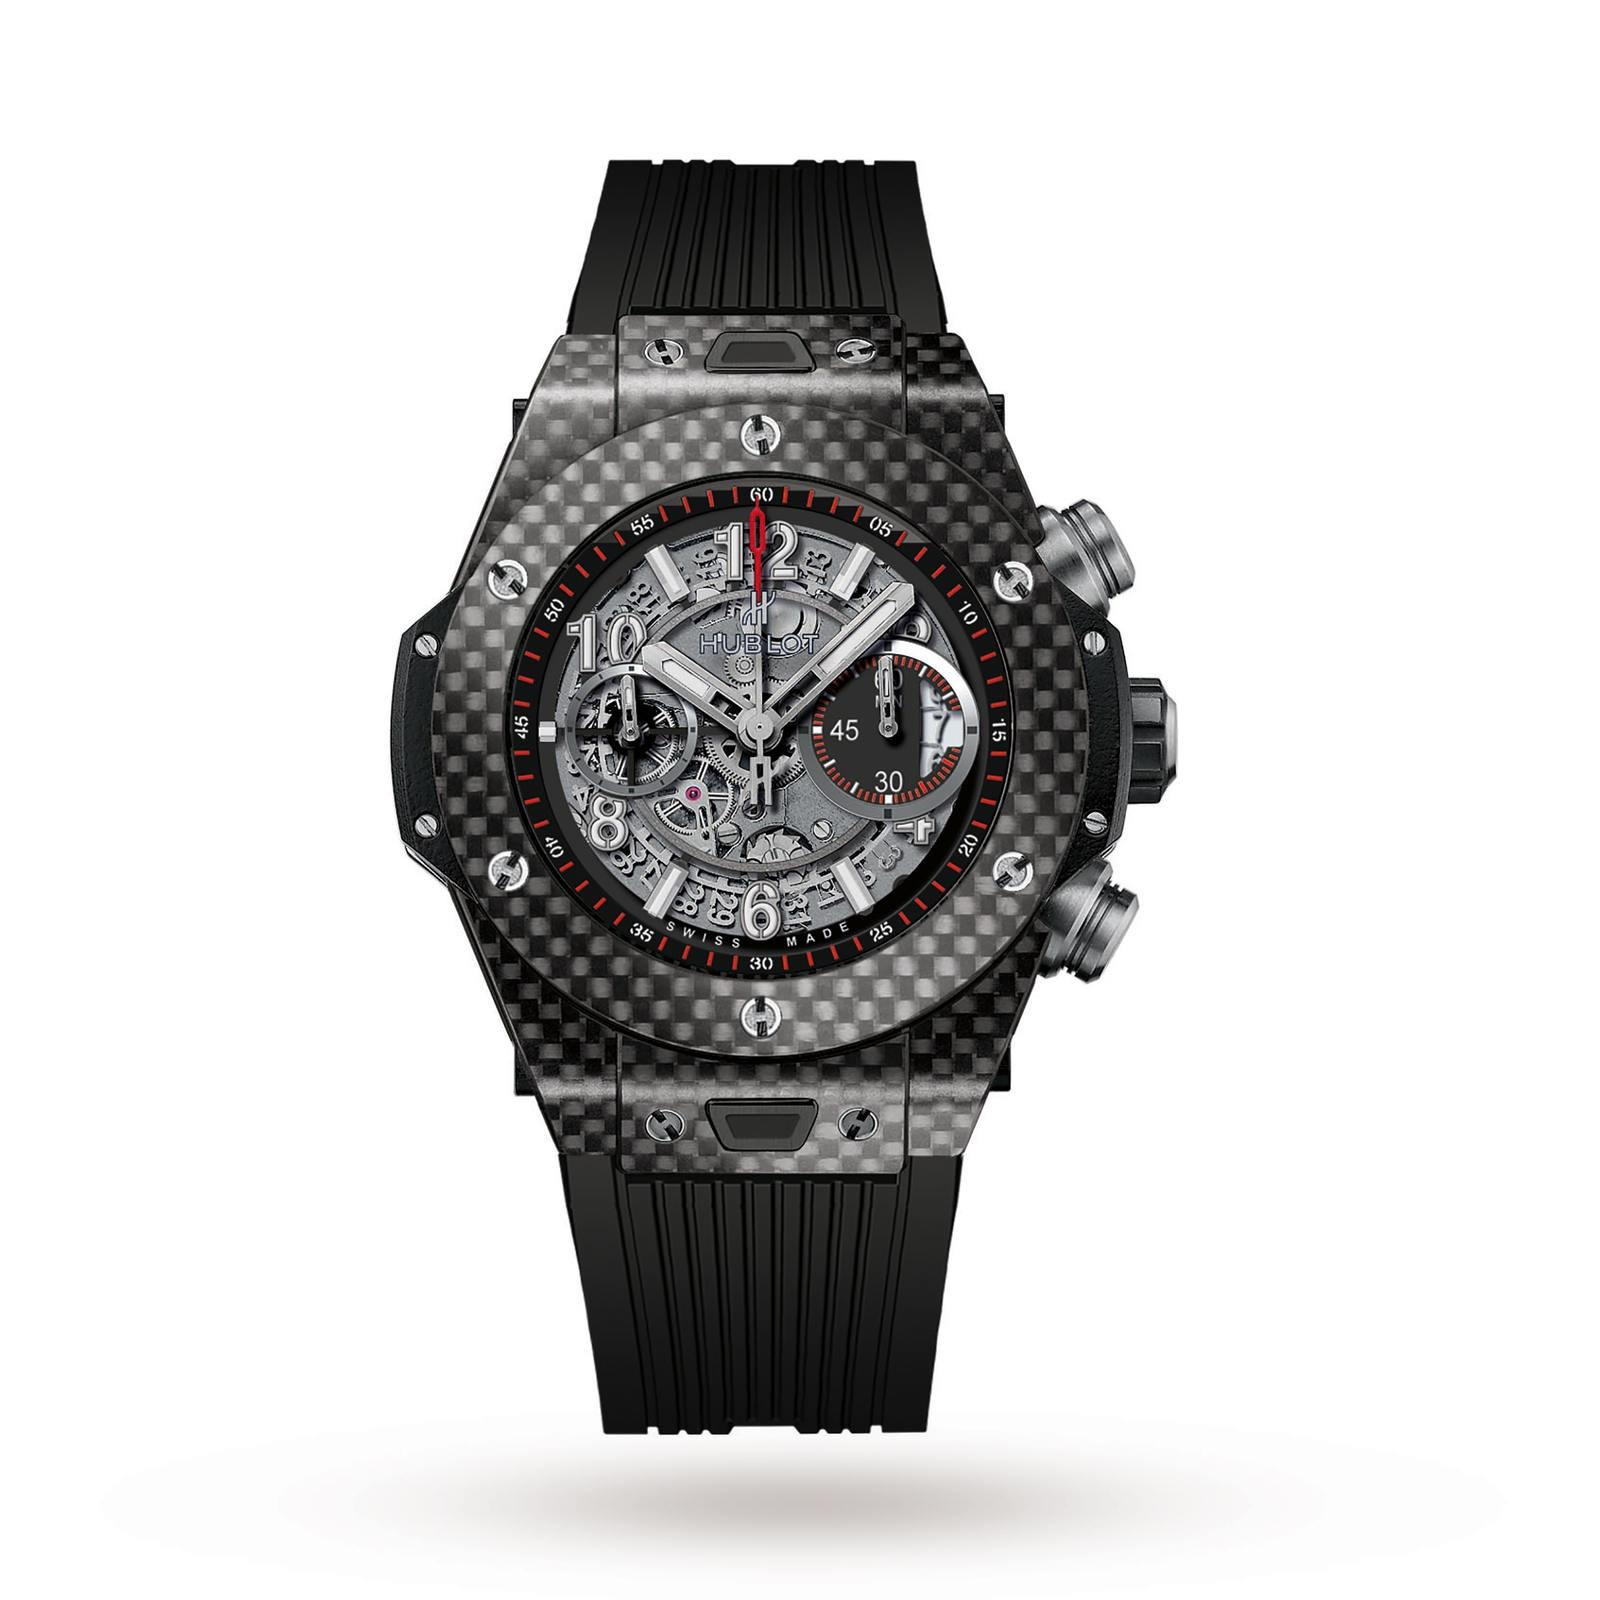 Hublot Hublot Big Bang UNICO Carbon 45mm Mens Watch